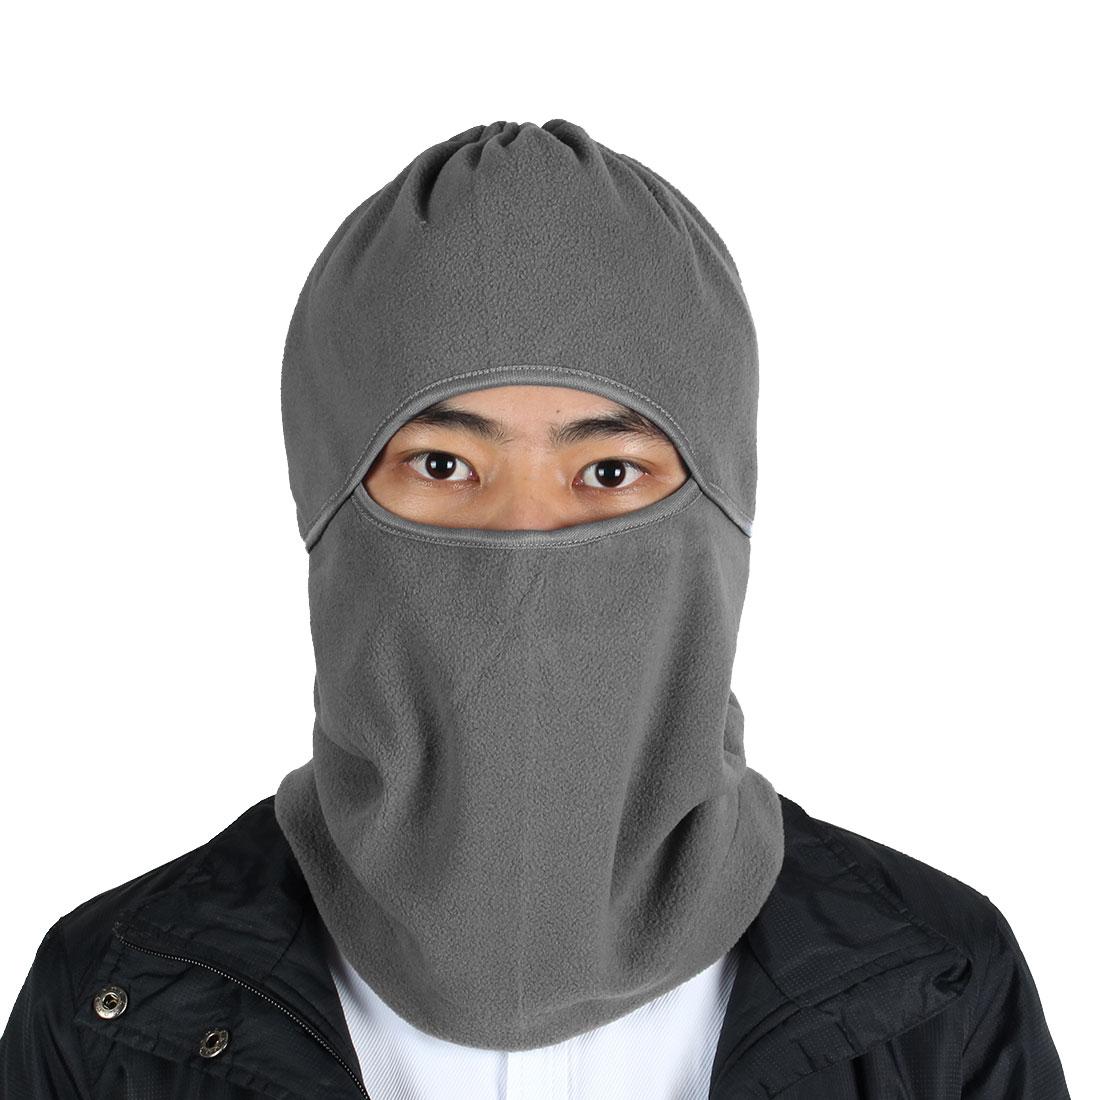 Outdoor Sports Fleece Full Face Mask Cover Neck Protecting Hood Balaclava Gray